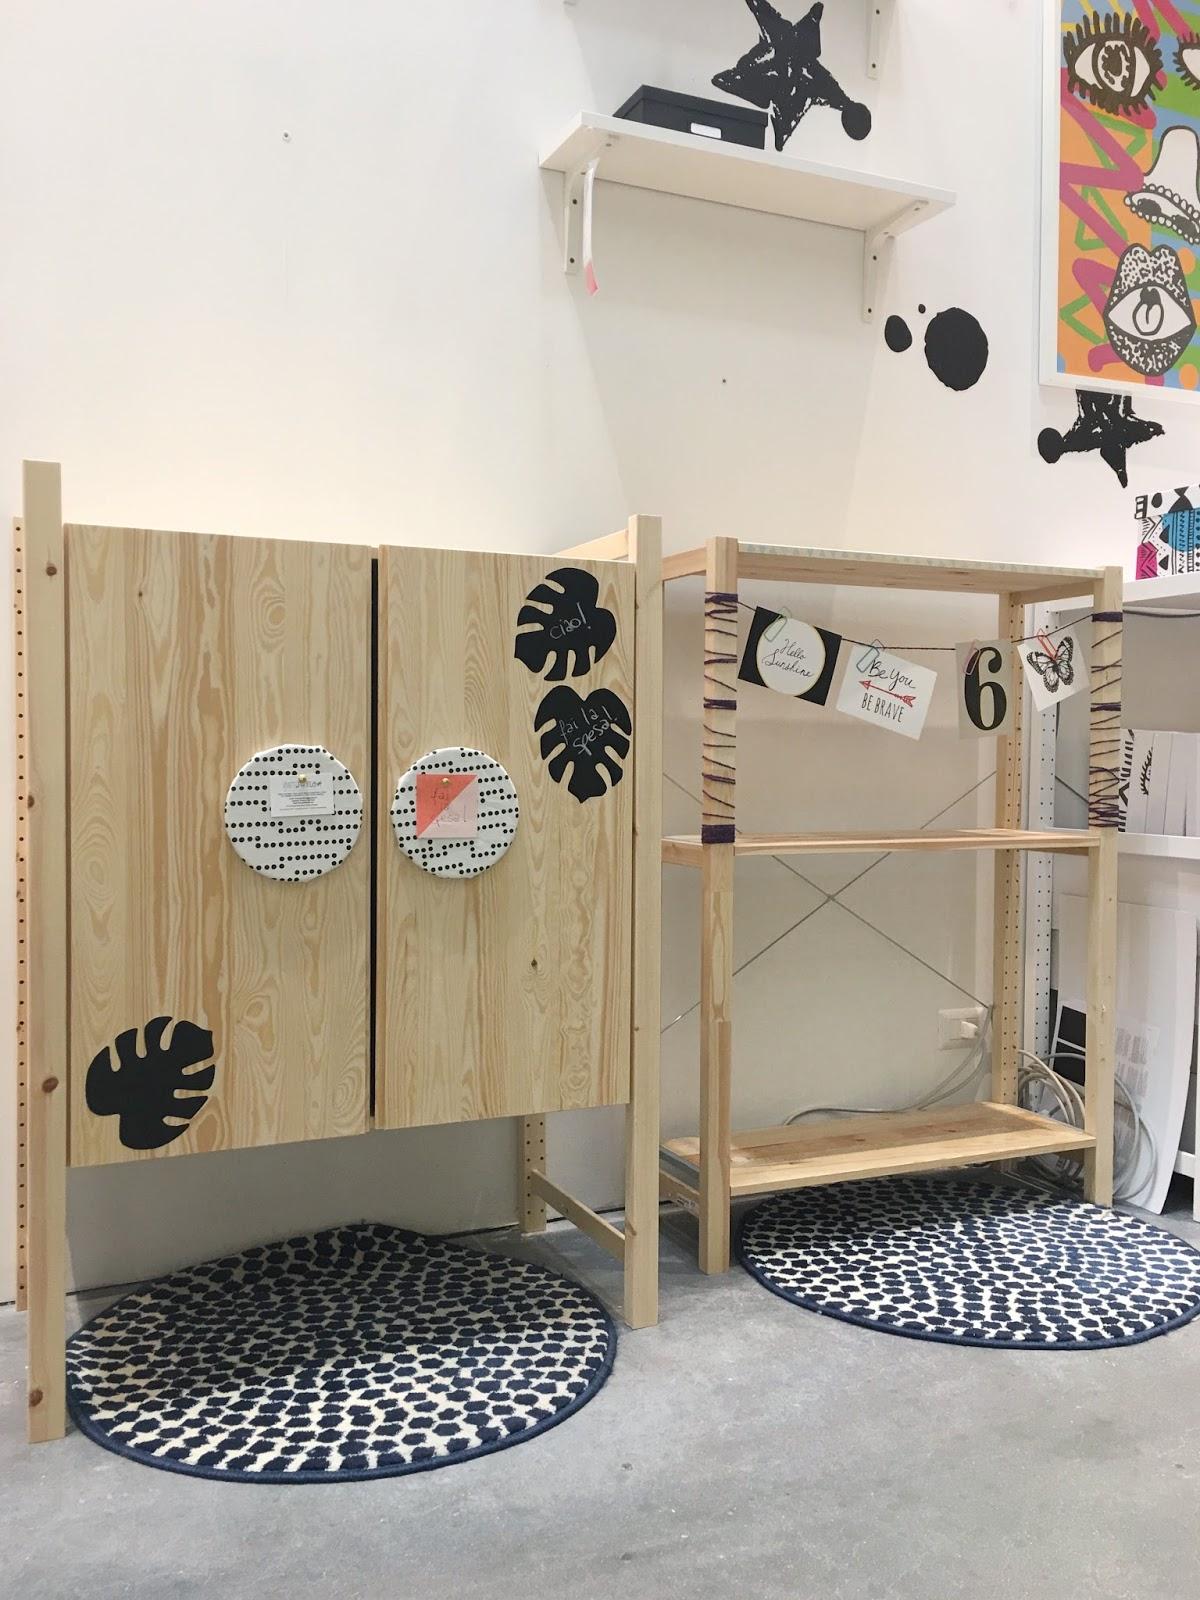 Ikea Scaffali Legno Ivar vivere a piedi nudi living barefoot: 6 idee per